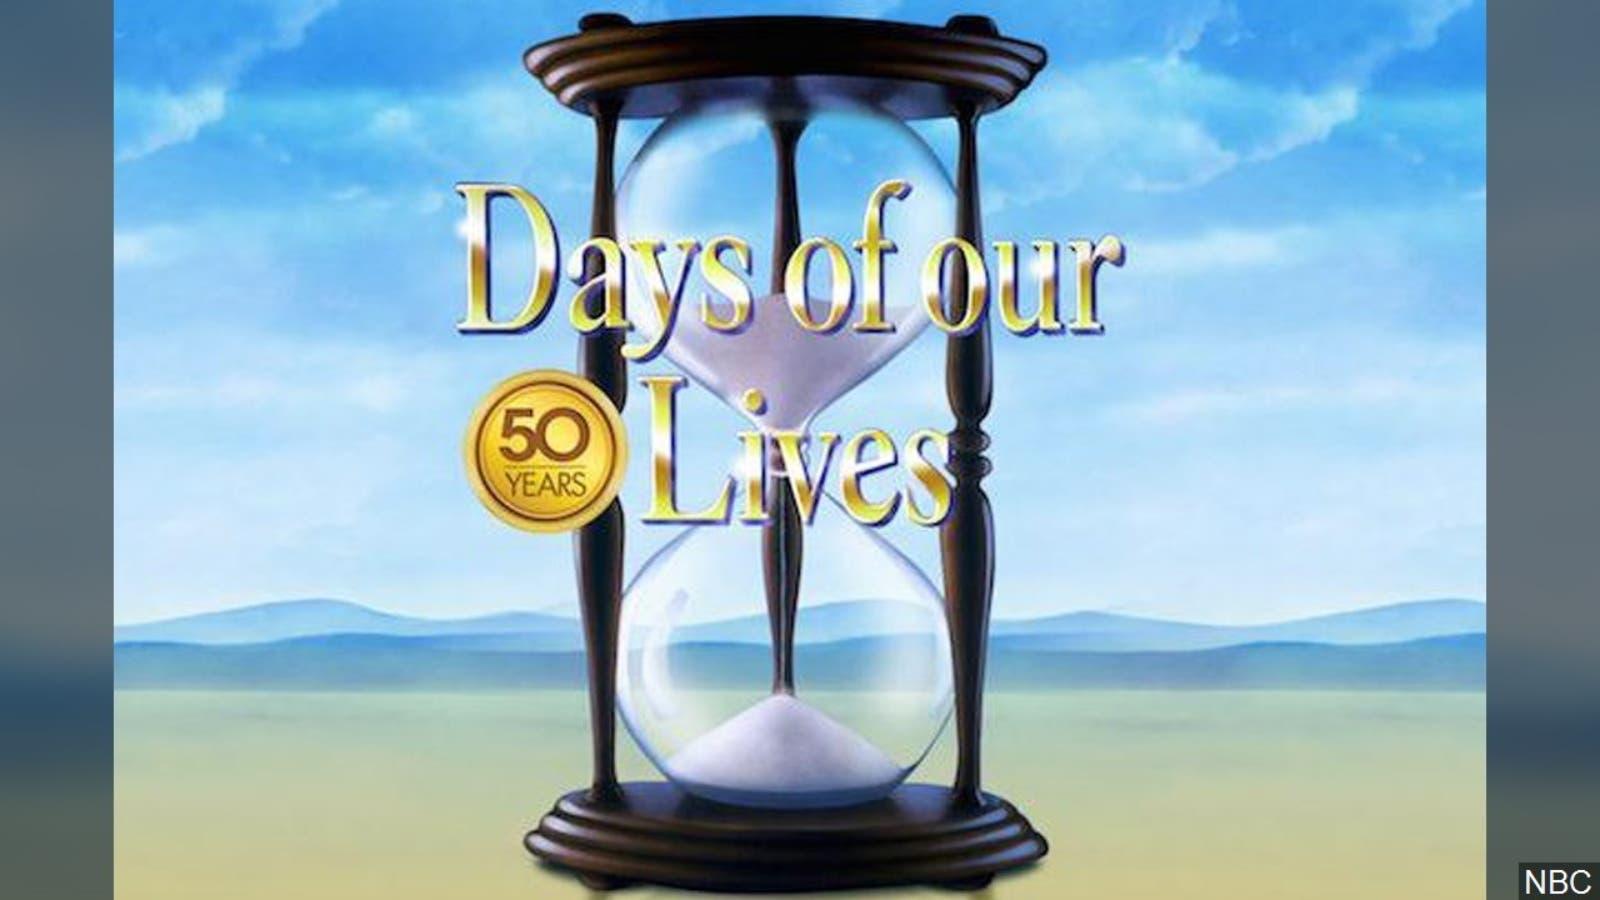 Days of our lives ينهي عقود طاقم الممثلين بالكامل.. هل هي حيلة تجارية أم نهاية عصر المسلسل؟